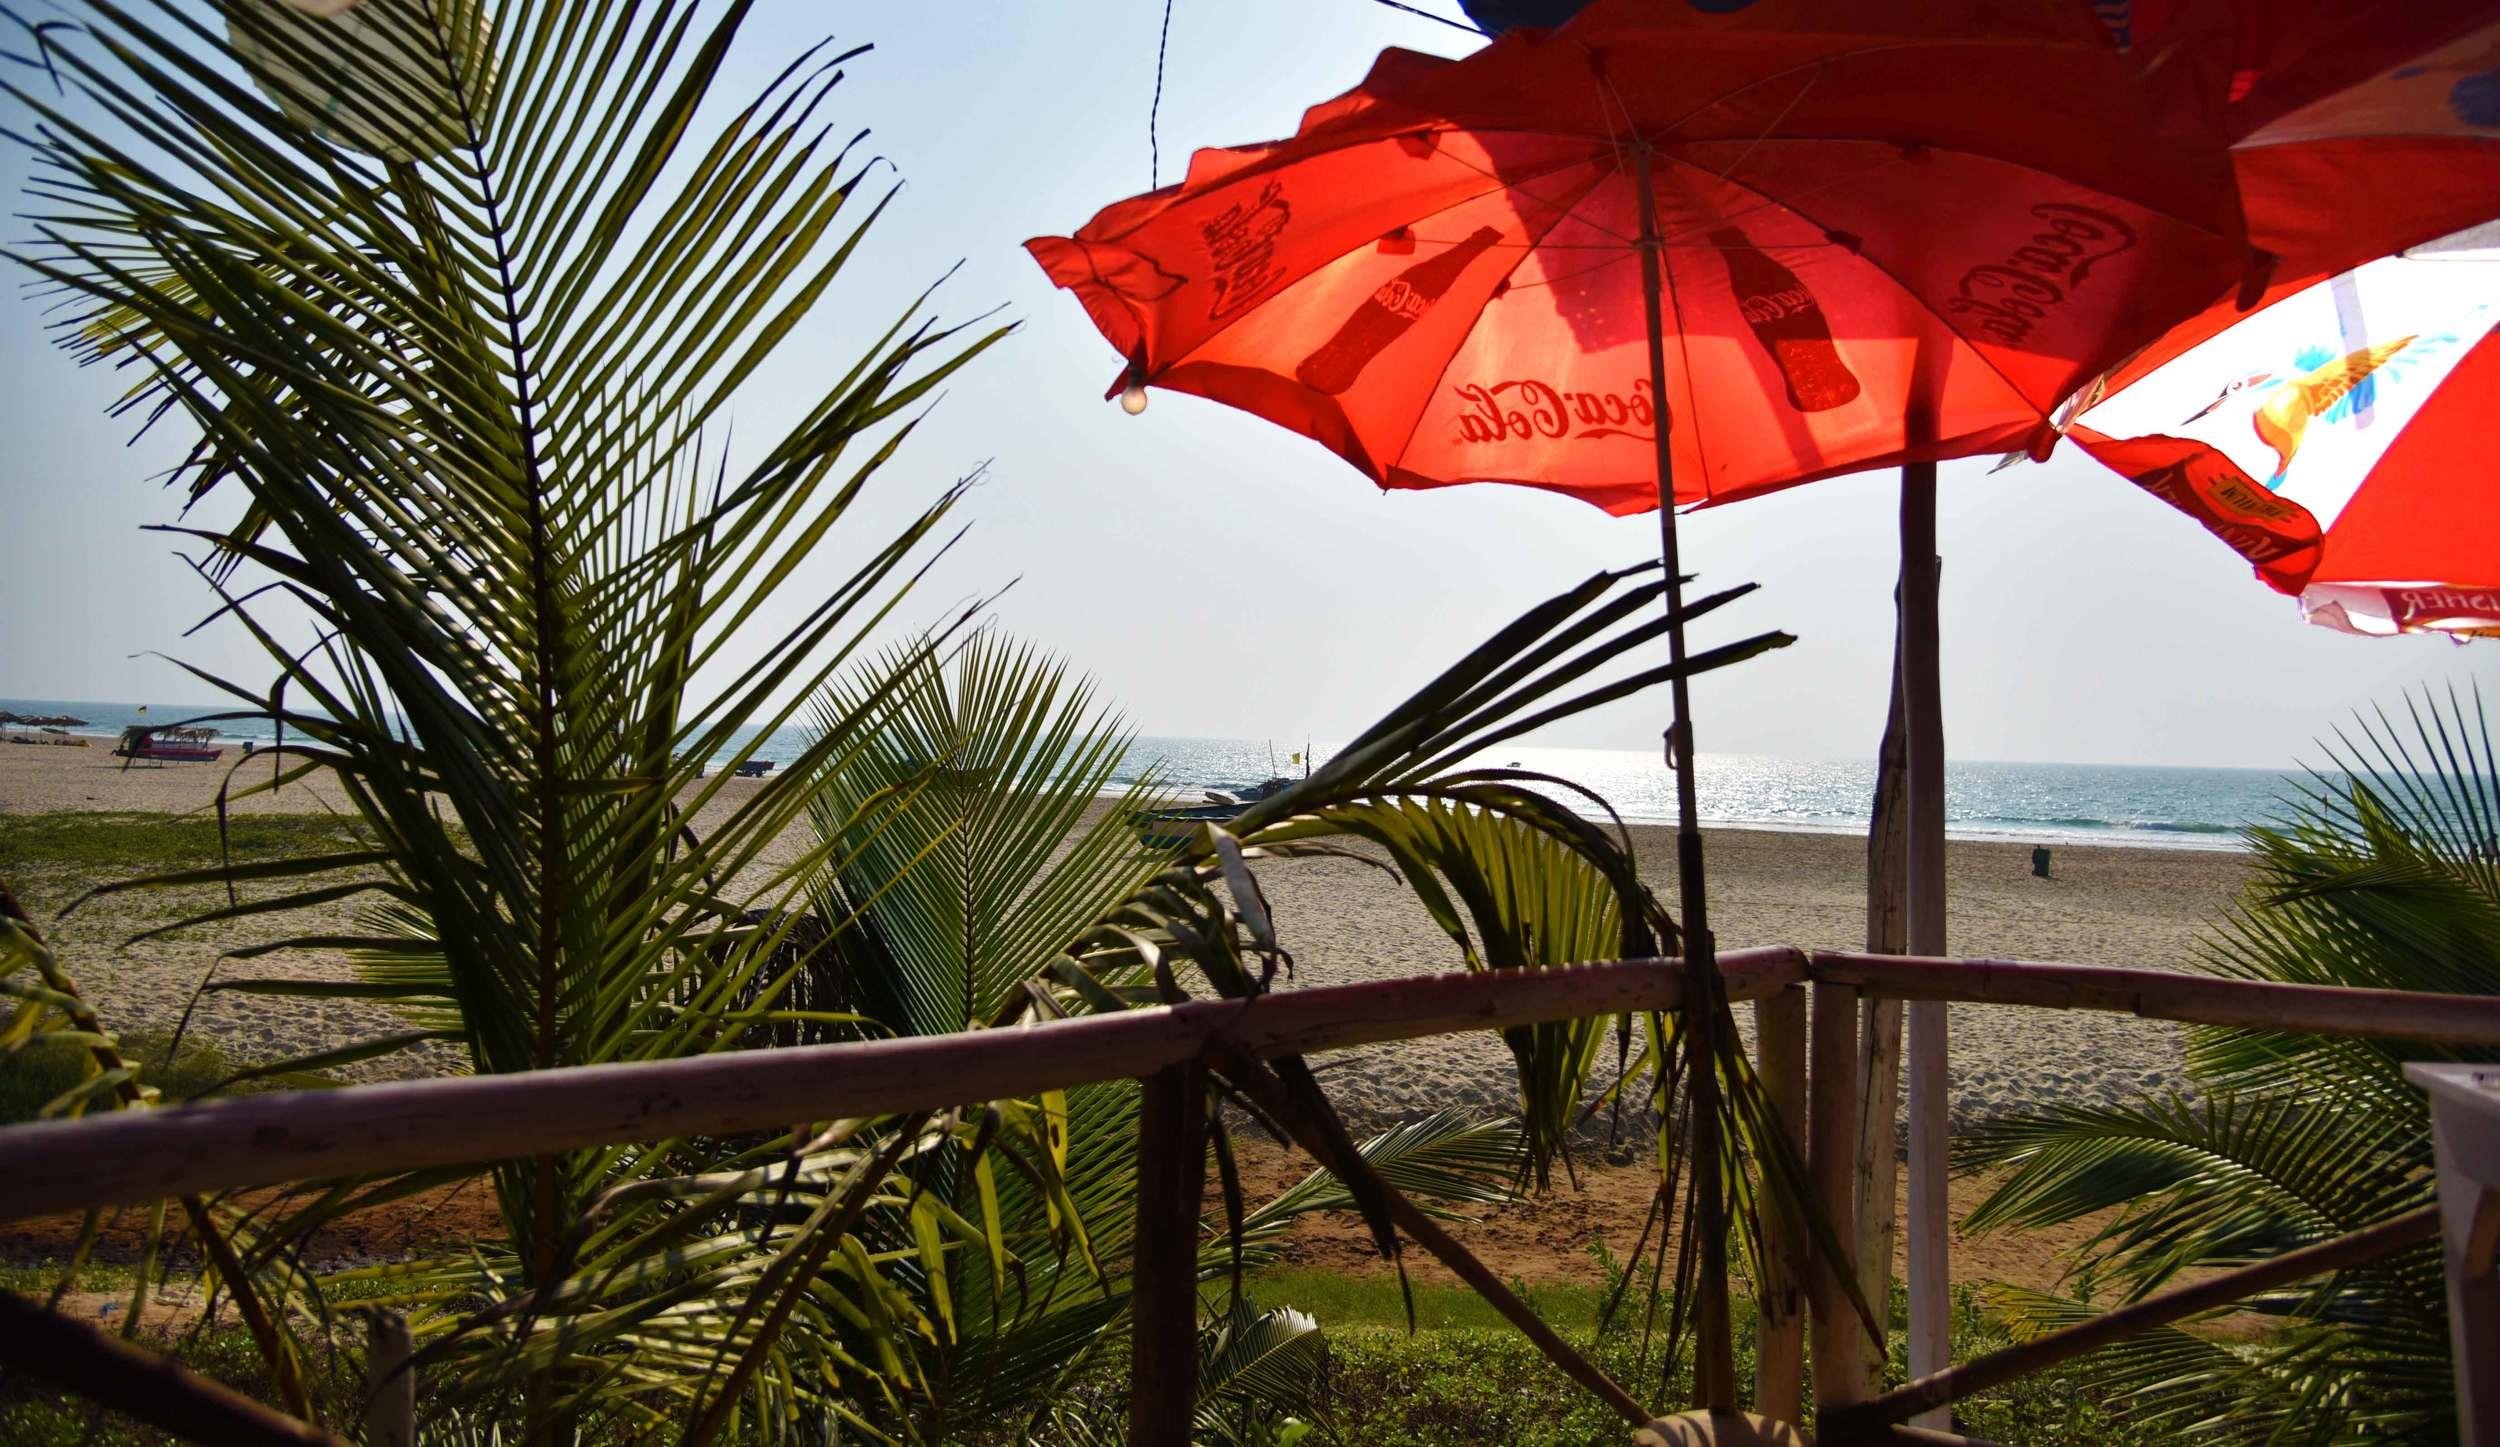 Zeebop by the sea, restaurants next to Park Hyatt Hotel, Goa, image©sourcingstyle.com.